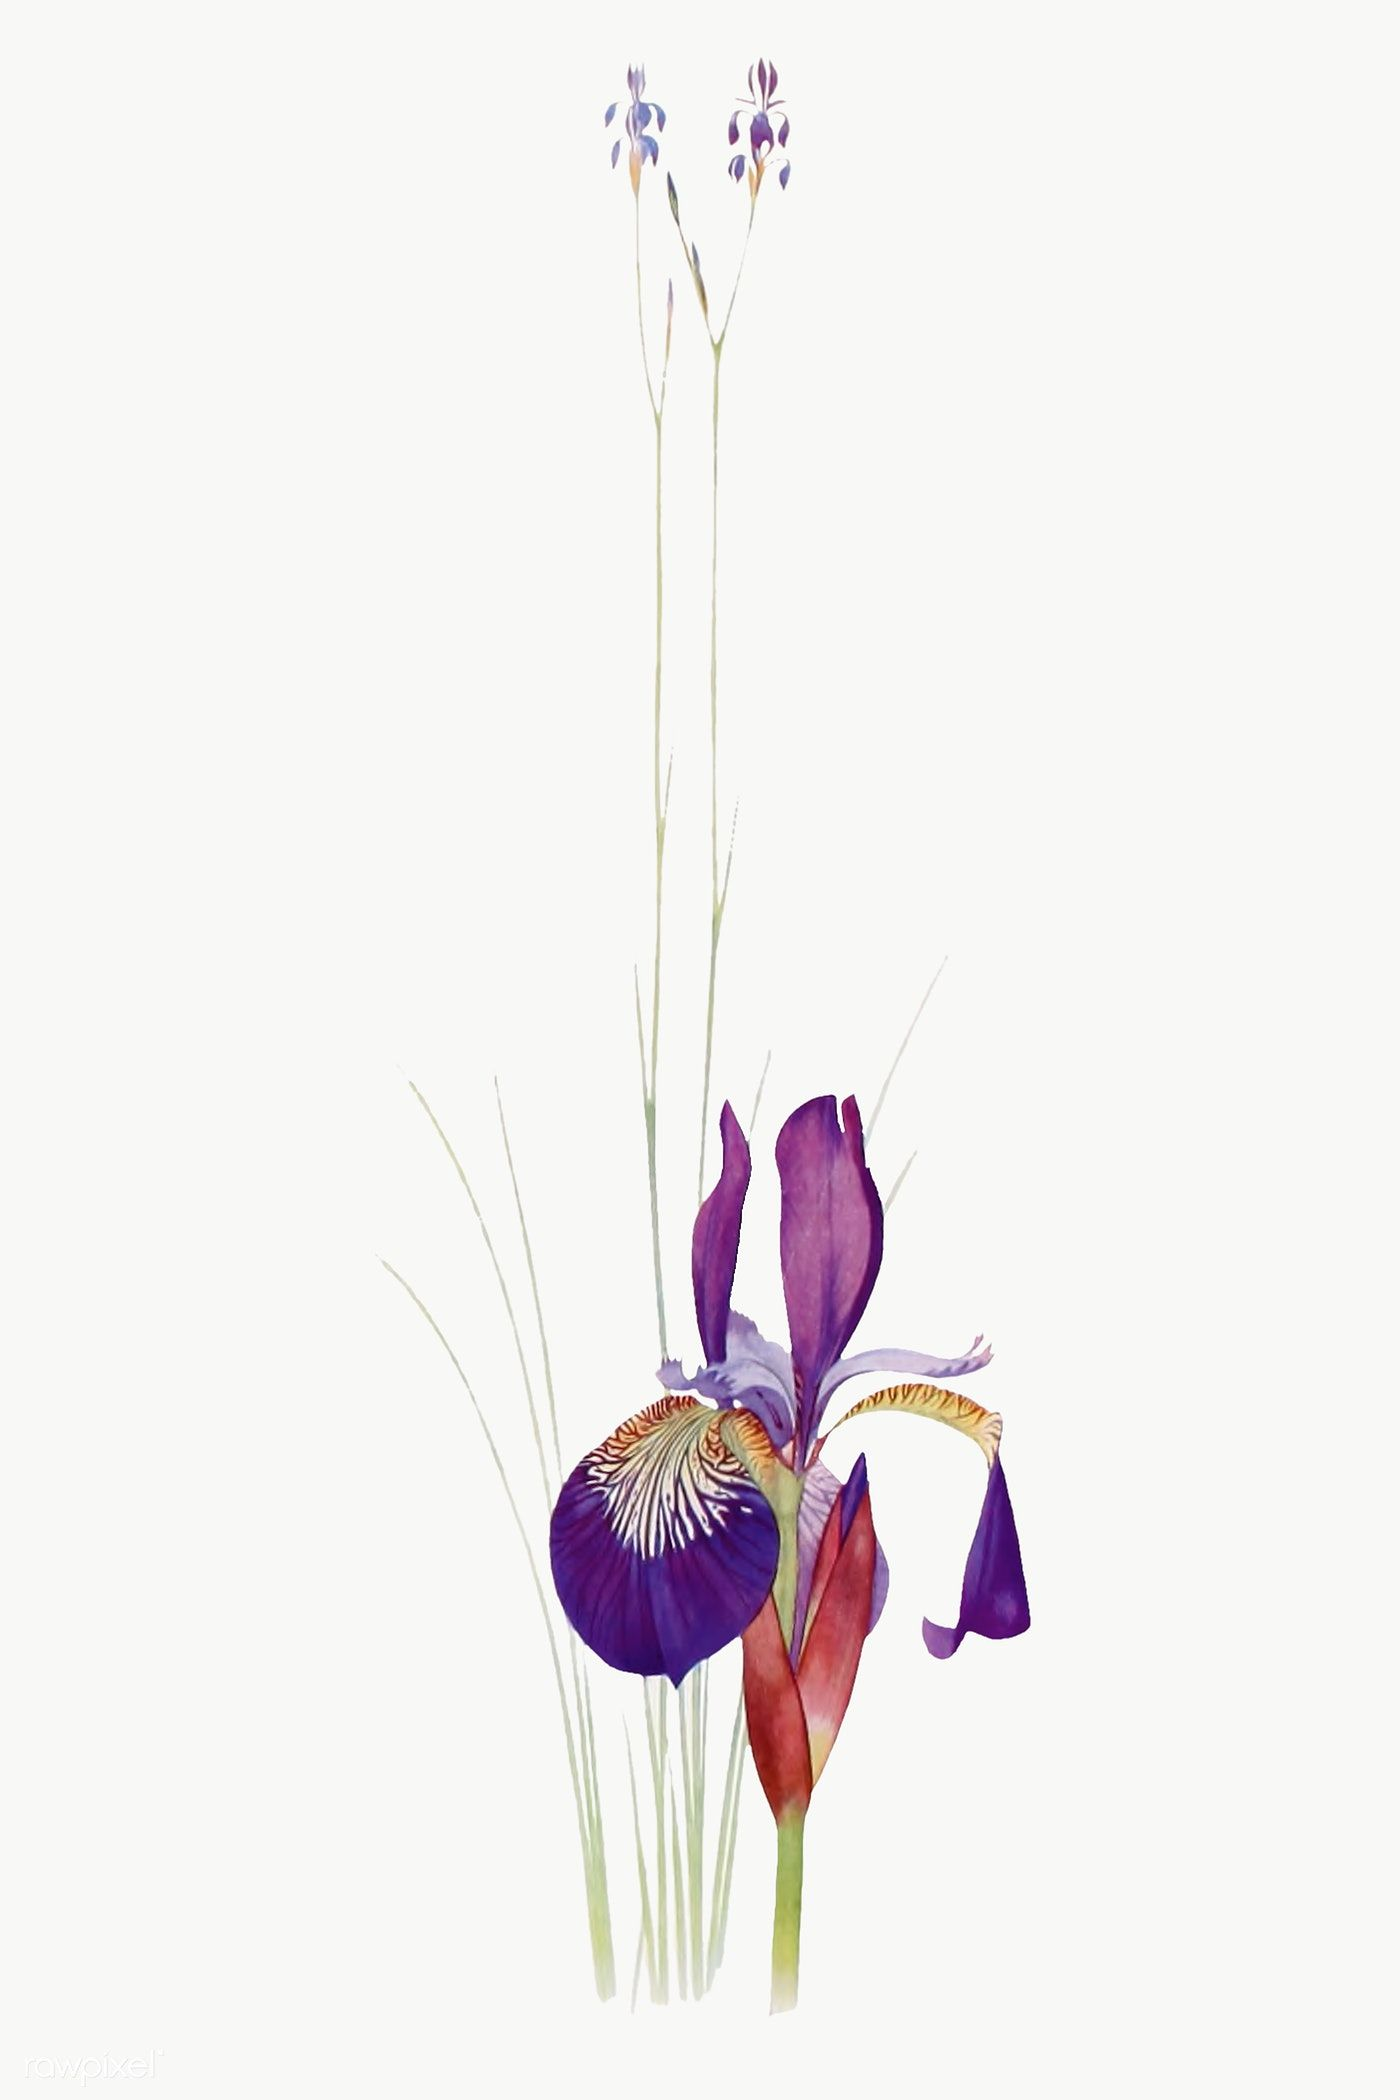 Vintage Iris Flower Illustration Transparent Png Premium Image By Rawpixel Com Flower Illustration Iris Flowers Flower Drawing